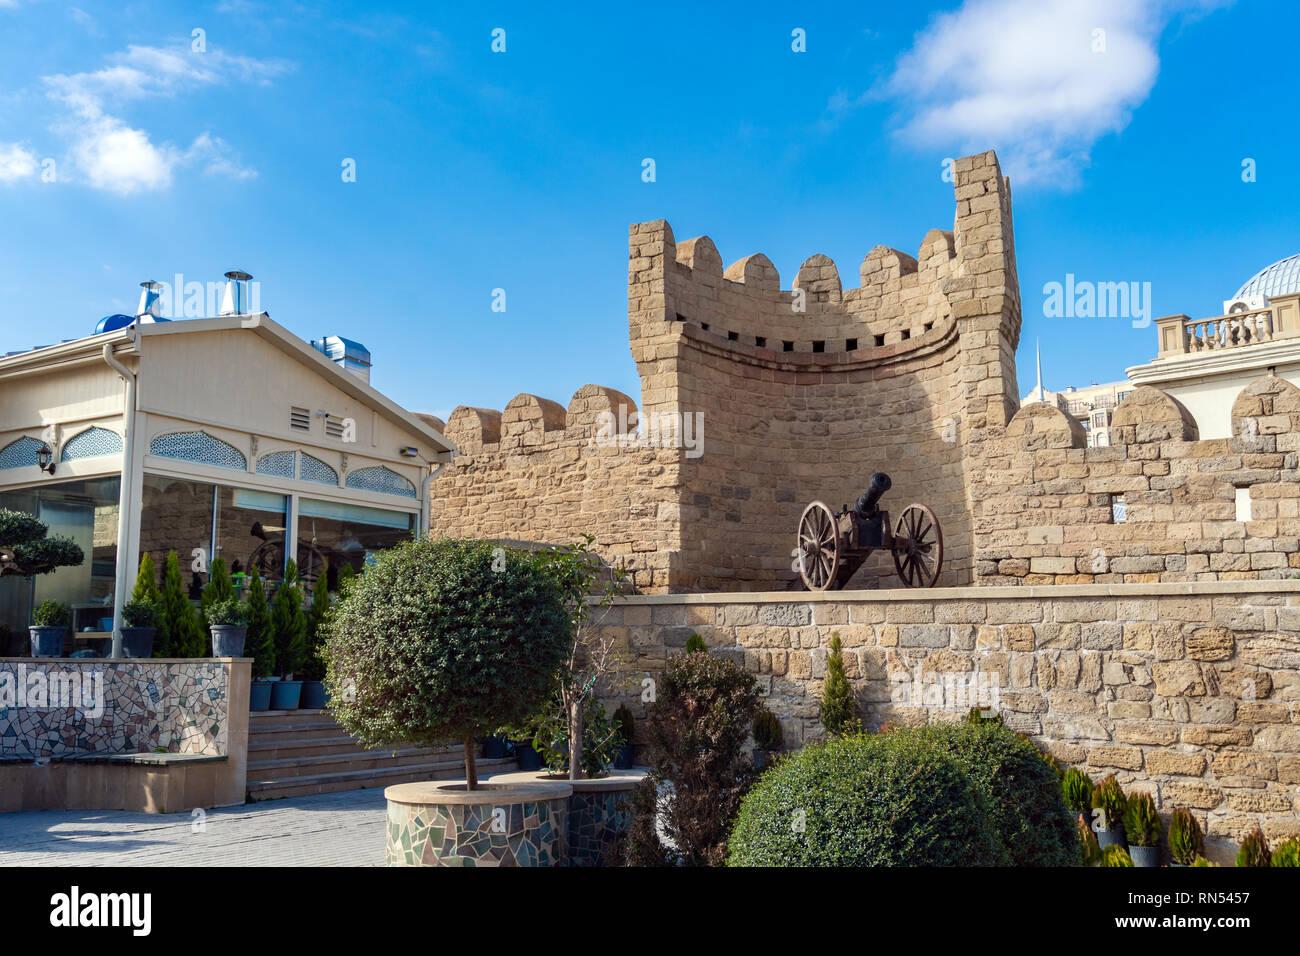 Ancient cannon in Icheri Sheher, Baku city, Azerbaijan - Stock Image